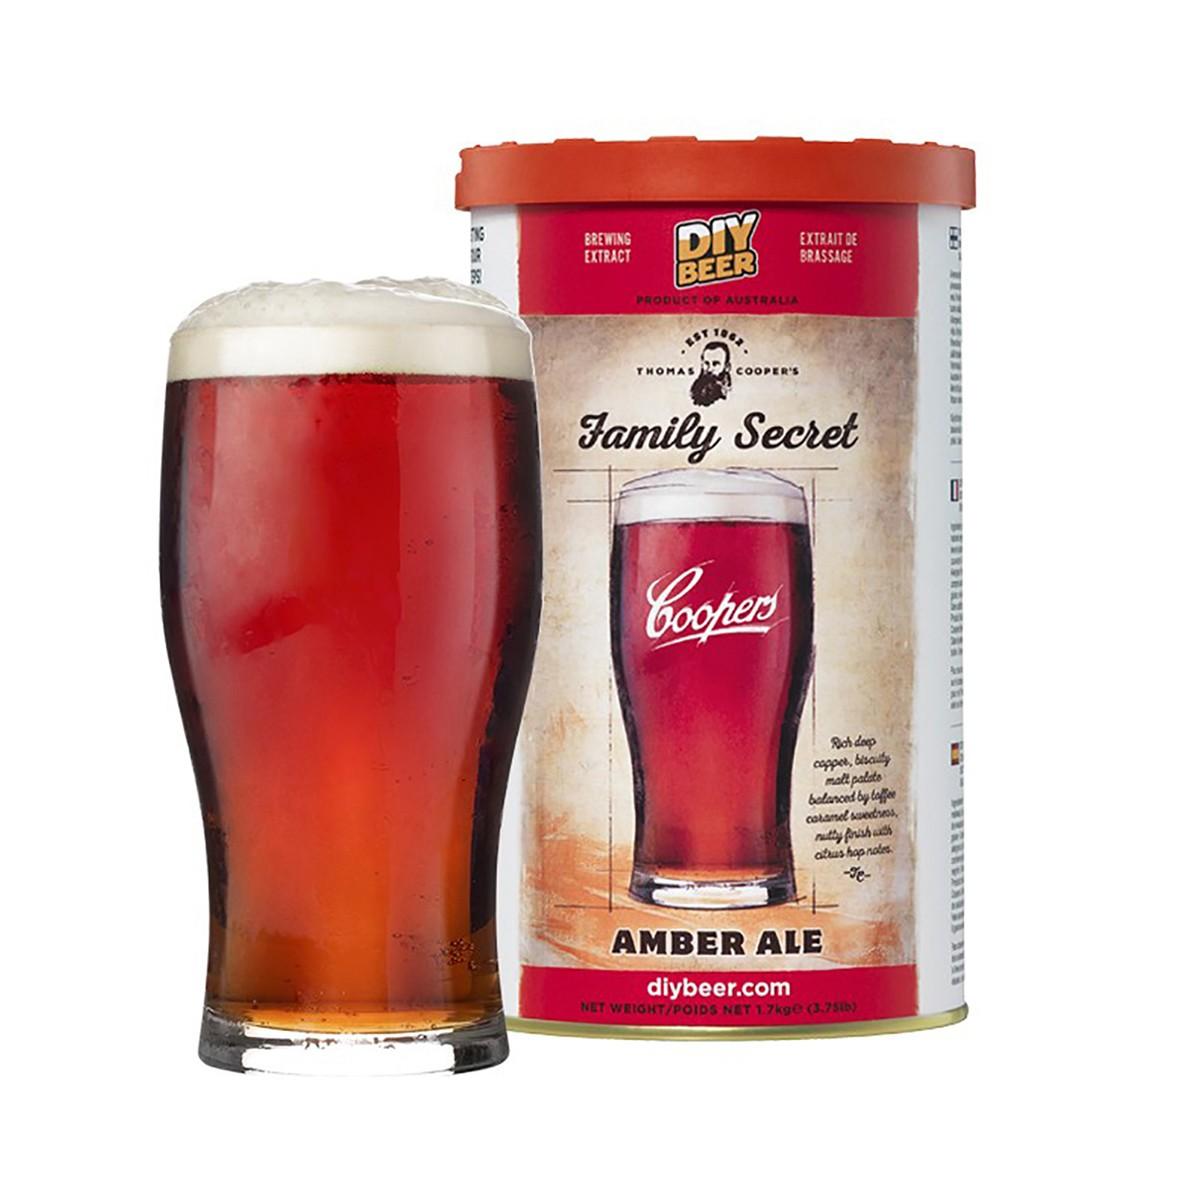 Birra Amber Ale